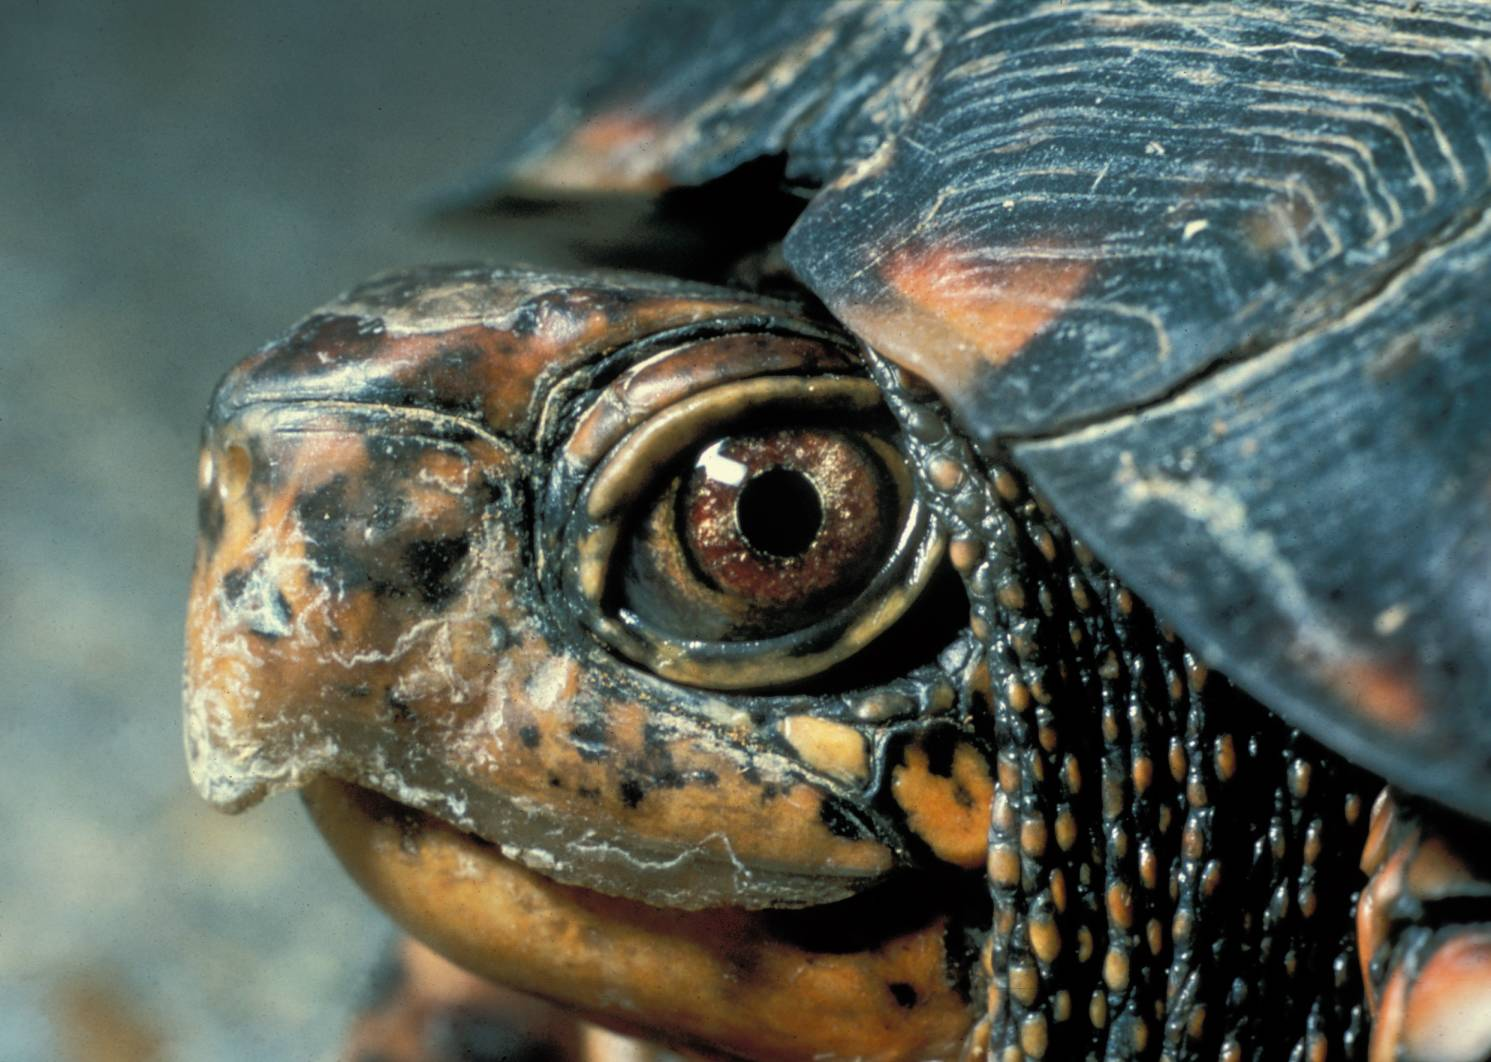 Eastern_Box_Turtle_Head